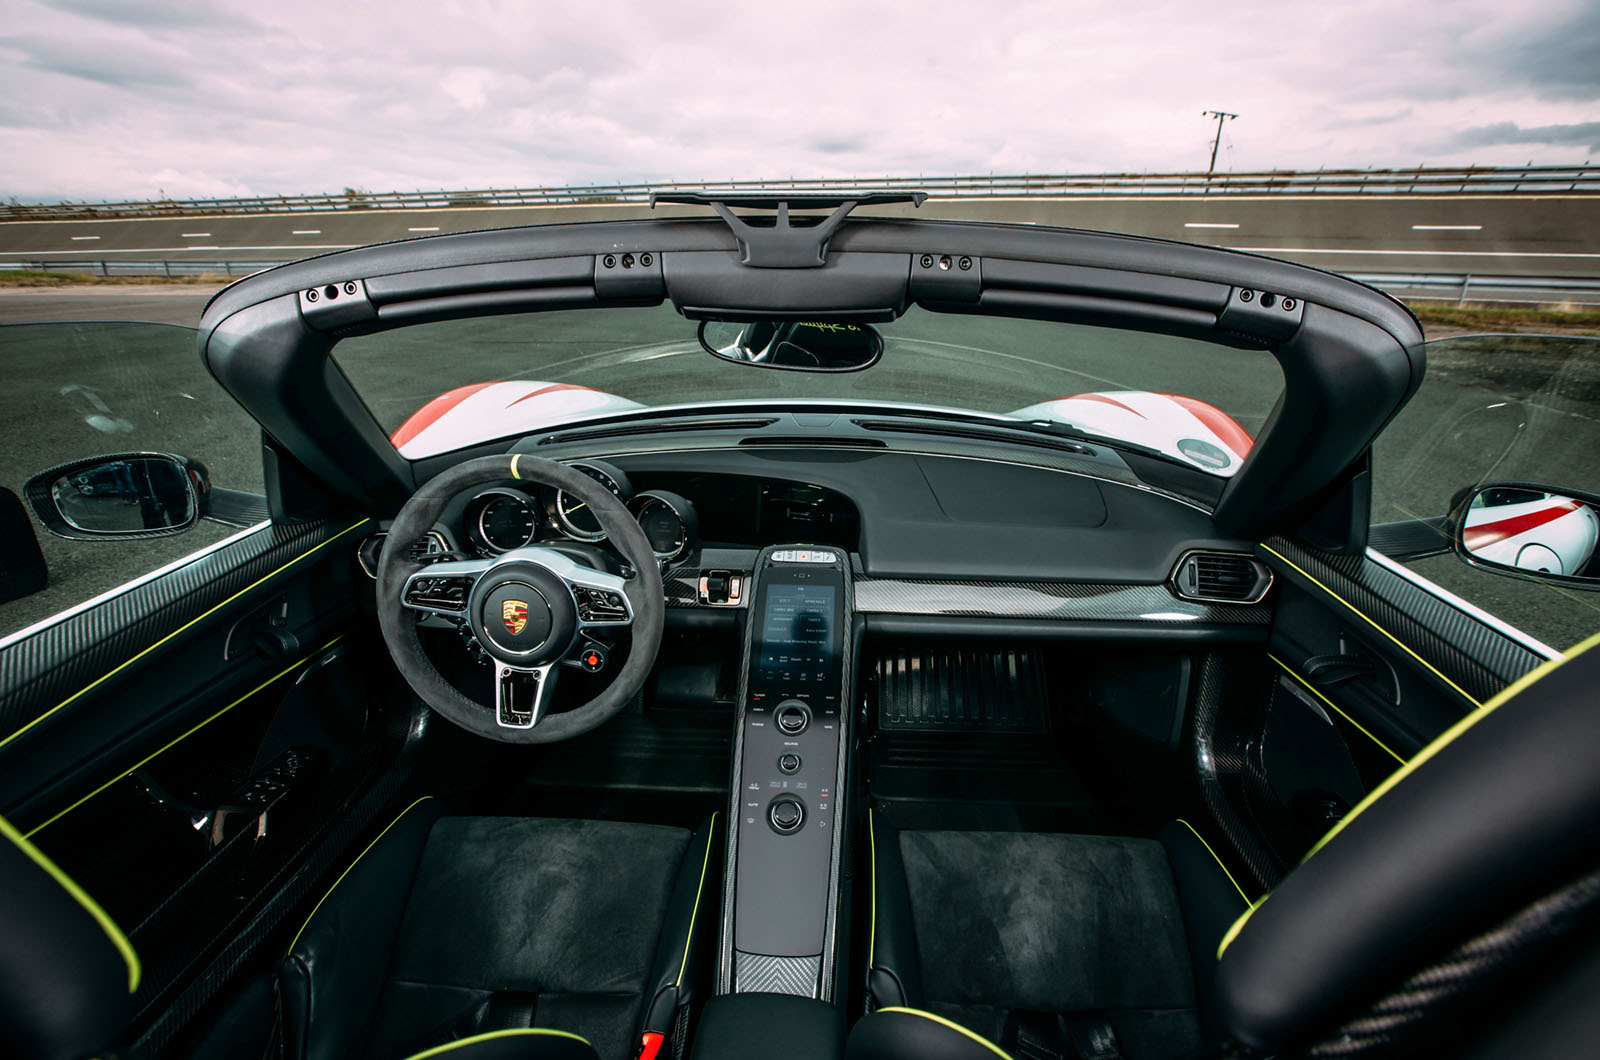 Porsche 918 Spyder 2013-2015 interior | Autocar  Porsche 918 Spyder 2015 Interior